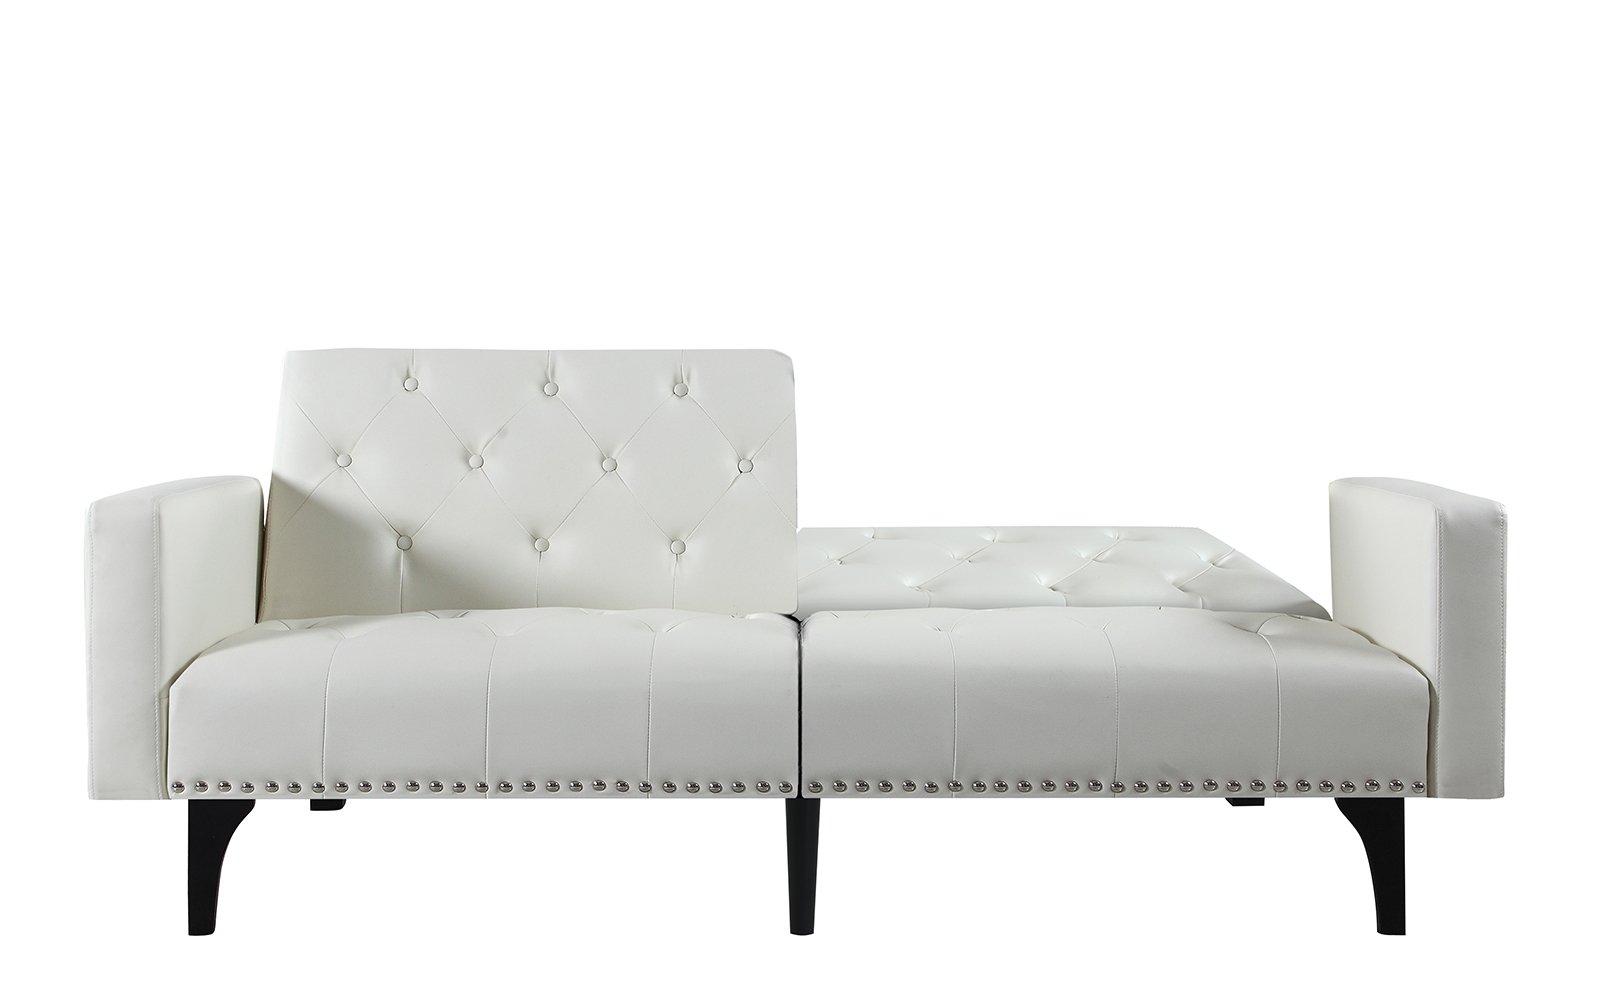 Tremendous Details About Split Back Futon Sofa In Bonded Leather Nailhead Trim Tufted Seats Back White Evergreenethics Interior Chair Design Evergreenethicsorg